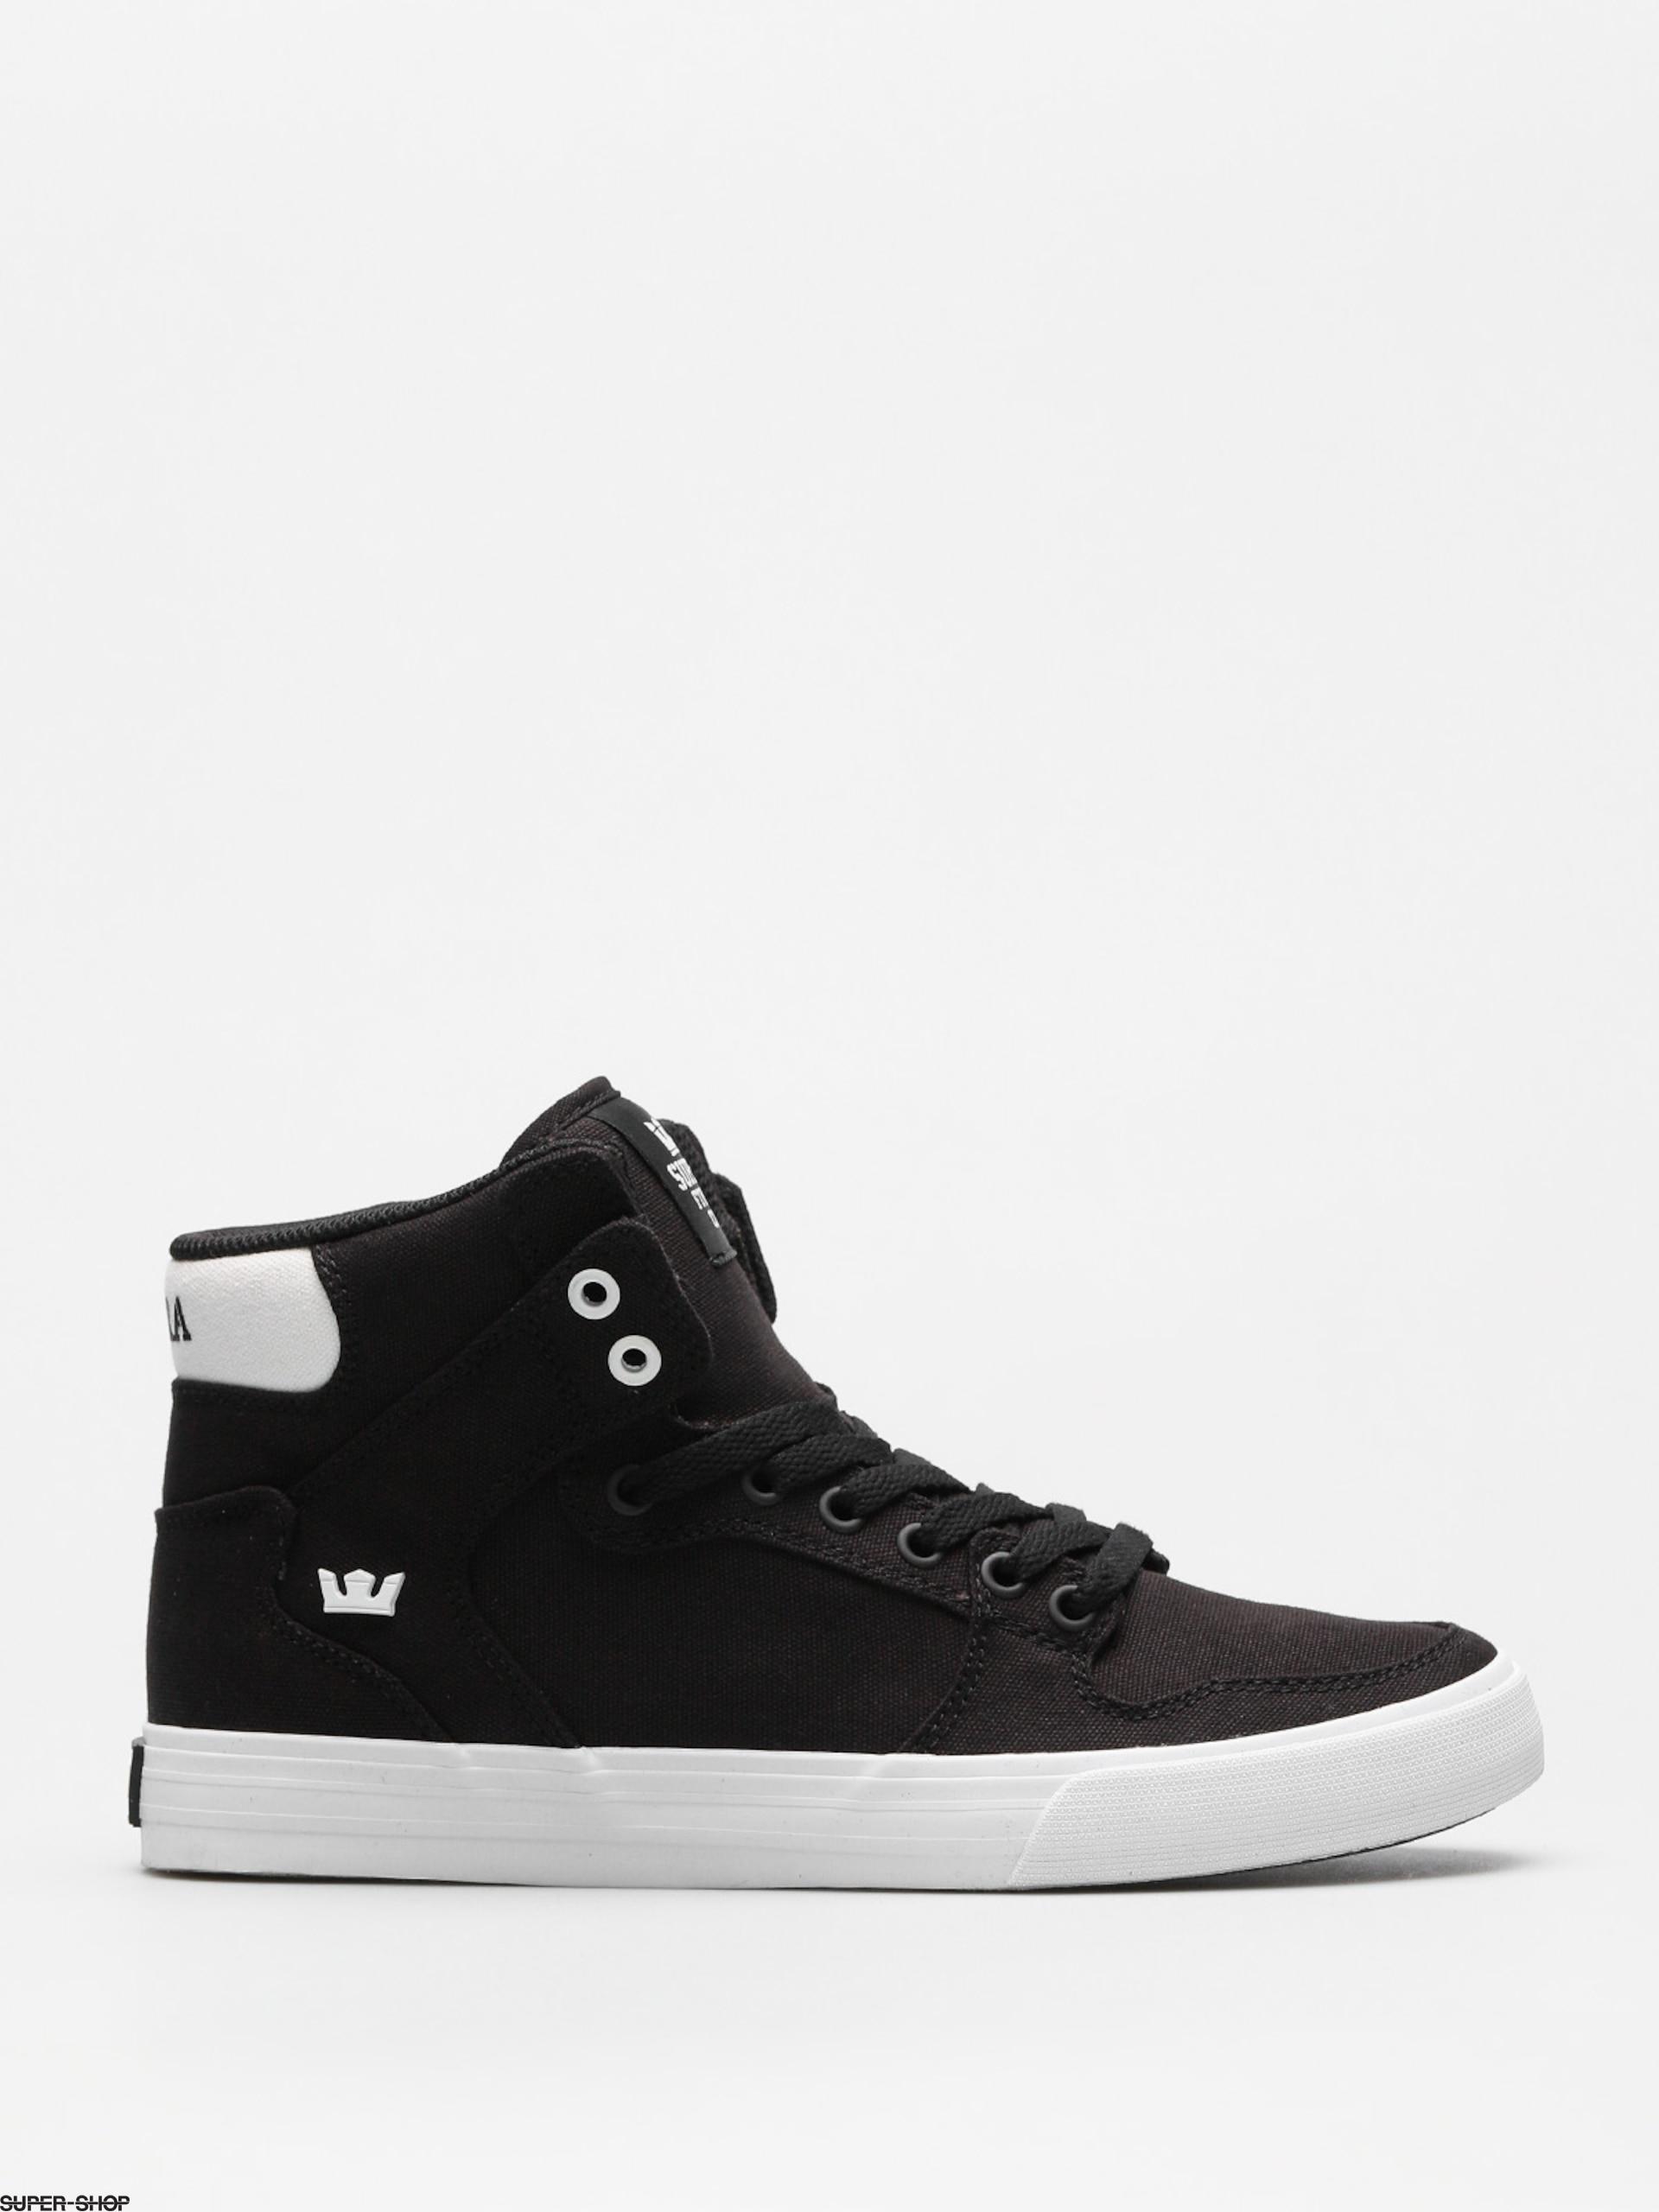 105c78a5fd69 935915-w1920-supra-shoes-vaider-black-white-white-black.jpg